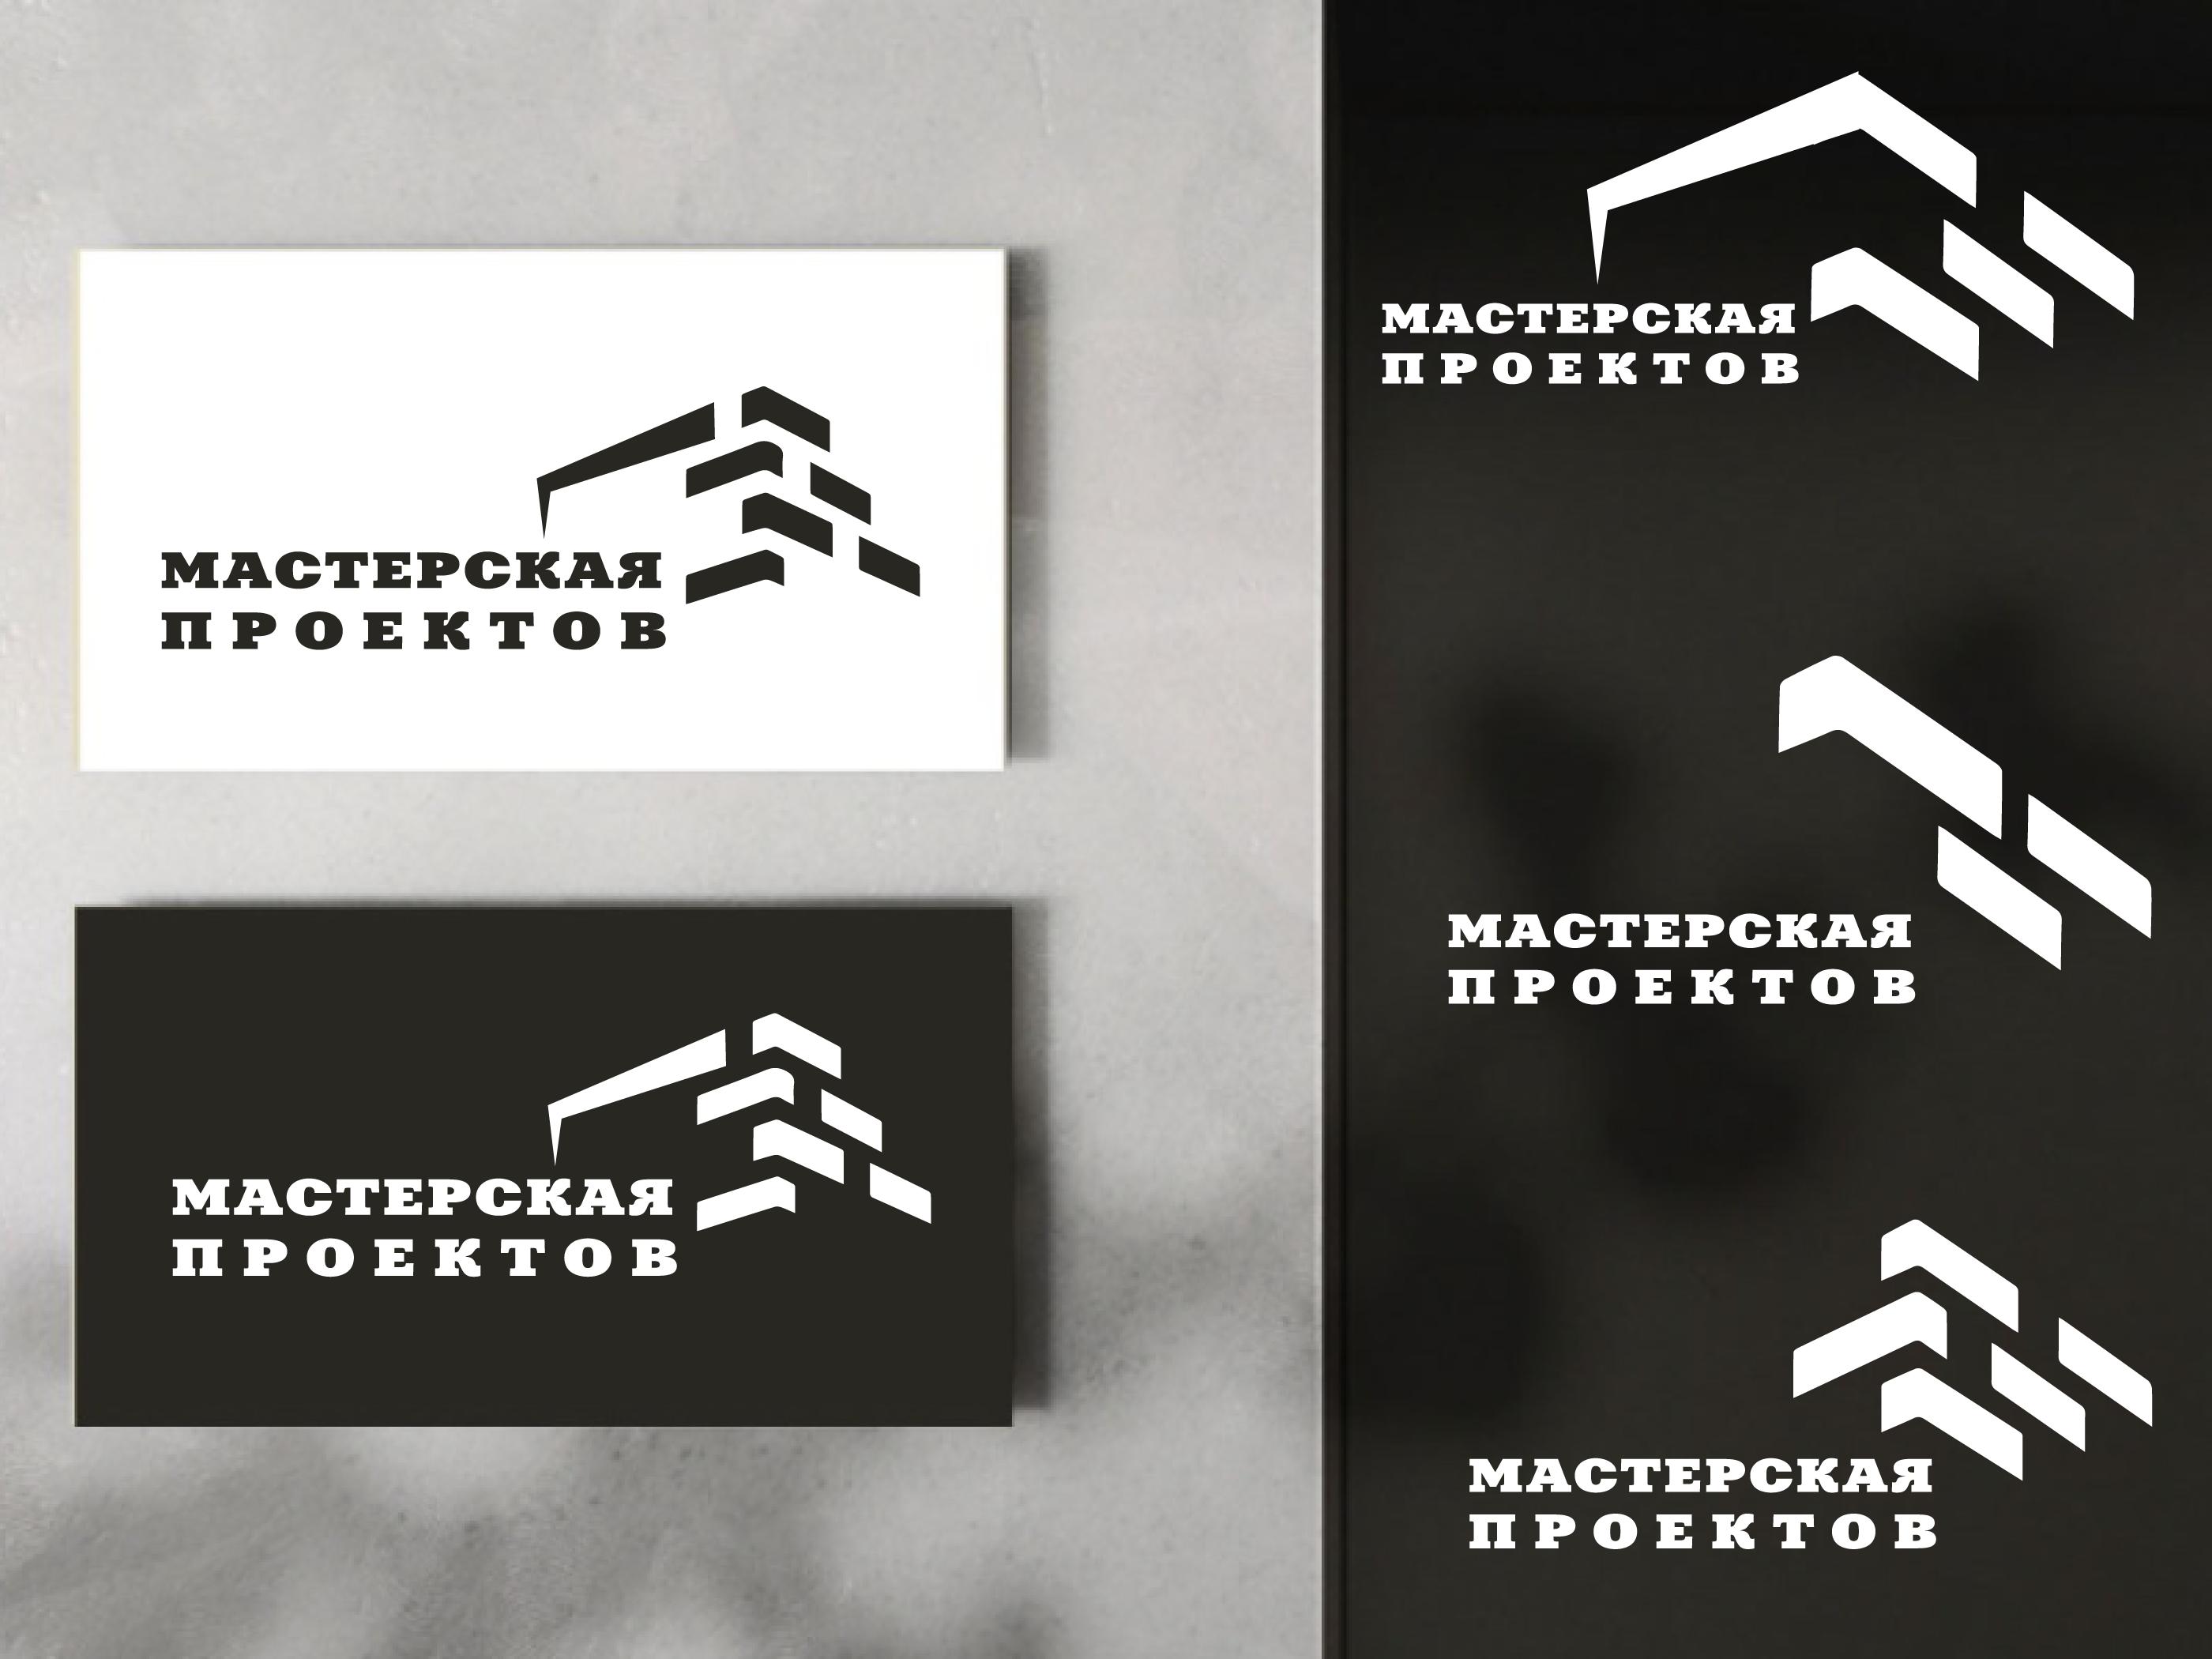 Разработка логотипа строительно-мебельного проекта (см. опис фото f_068606ea6e33fbe1.png